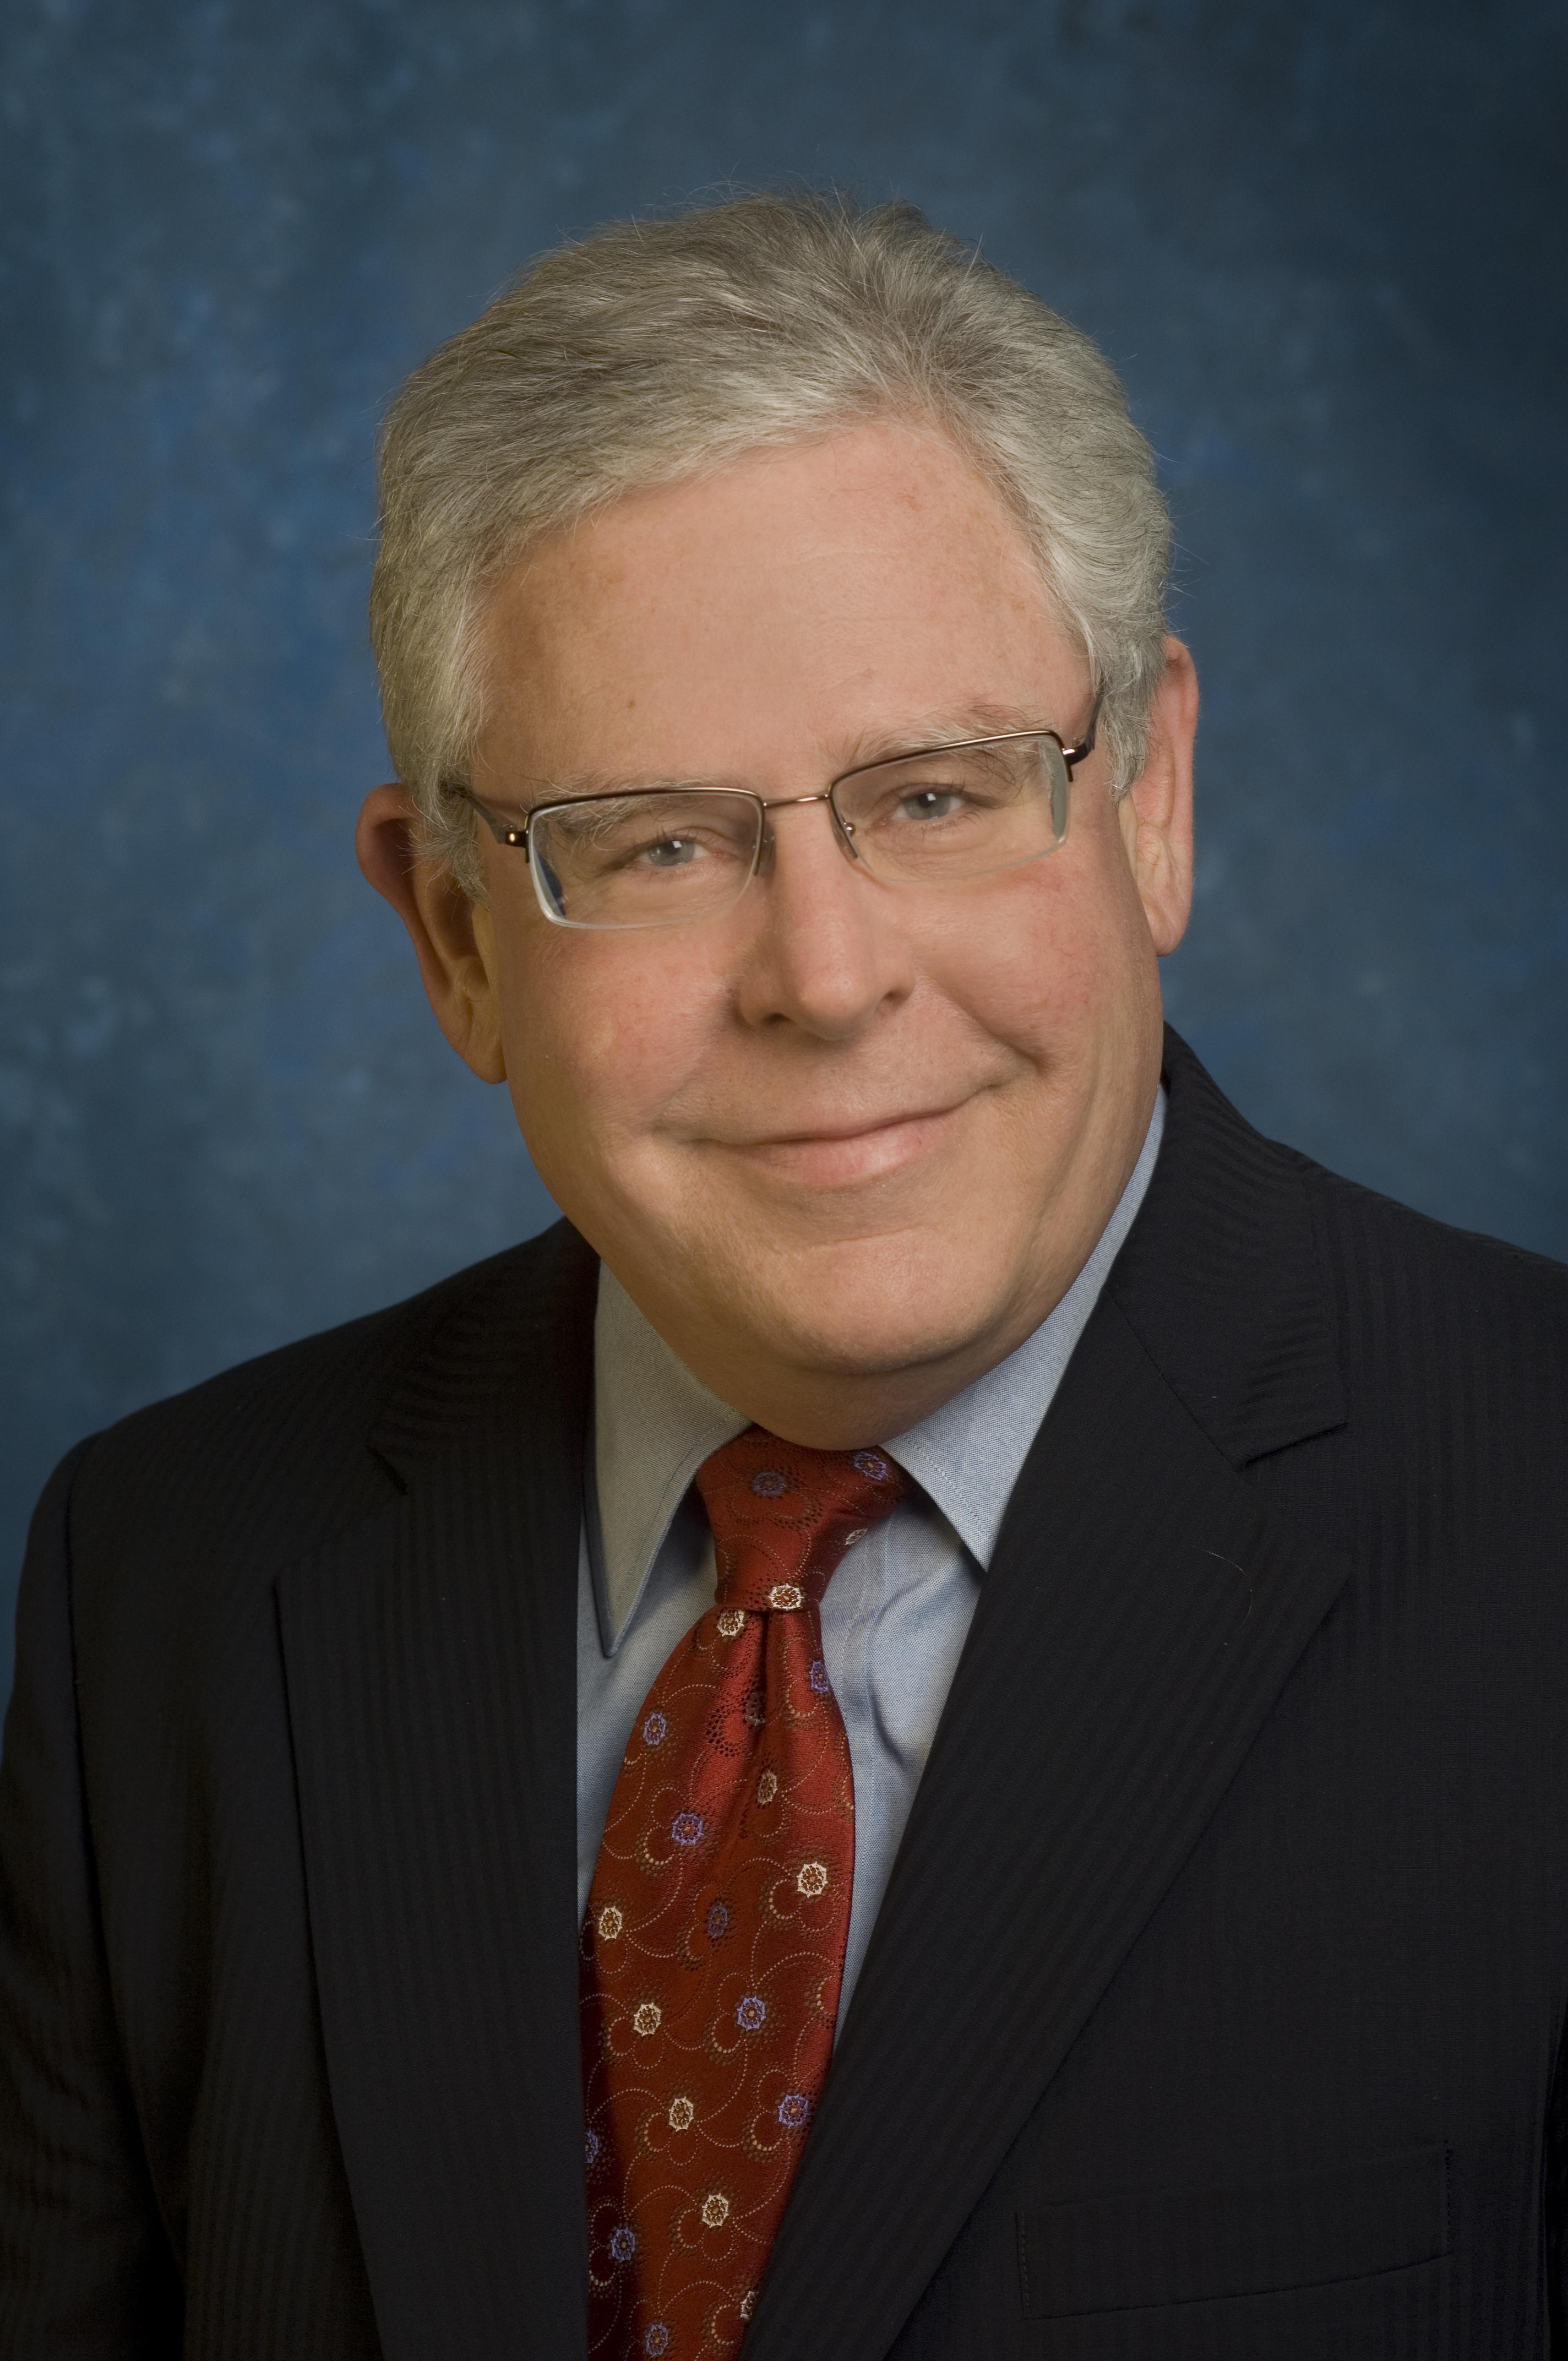 Barclay Berdan - THR, Senior Executive Vice President & Chief Operations Officer